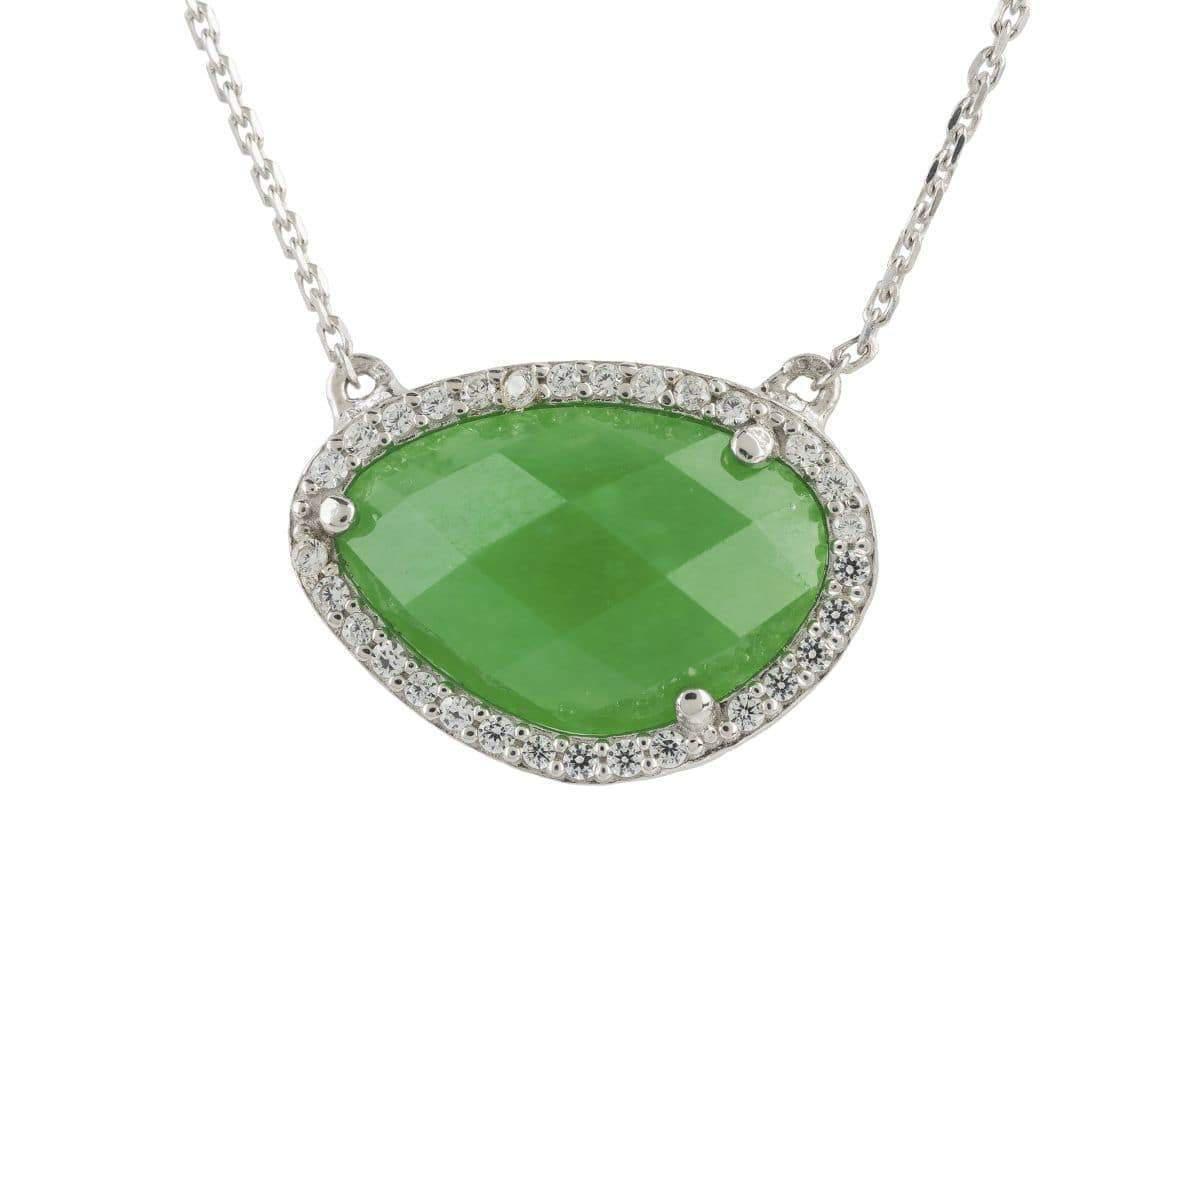 Latelita London Sofia Green Onyx Gemstone Necklace Gold tG3FJ6Gx